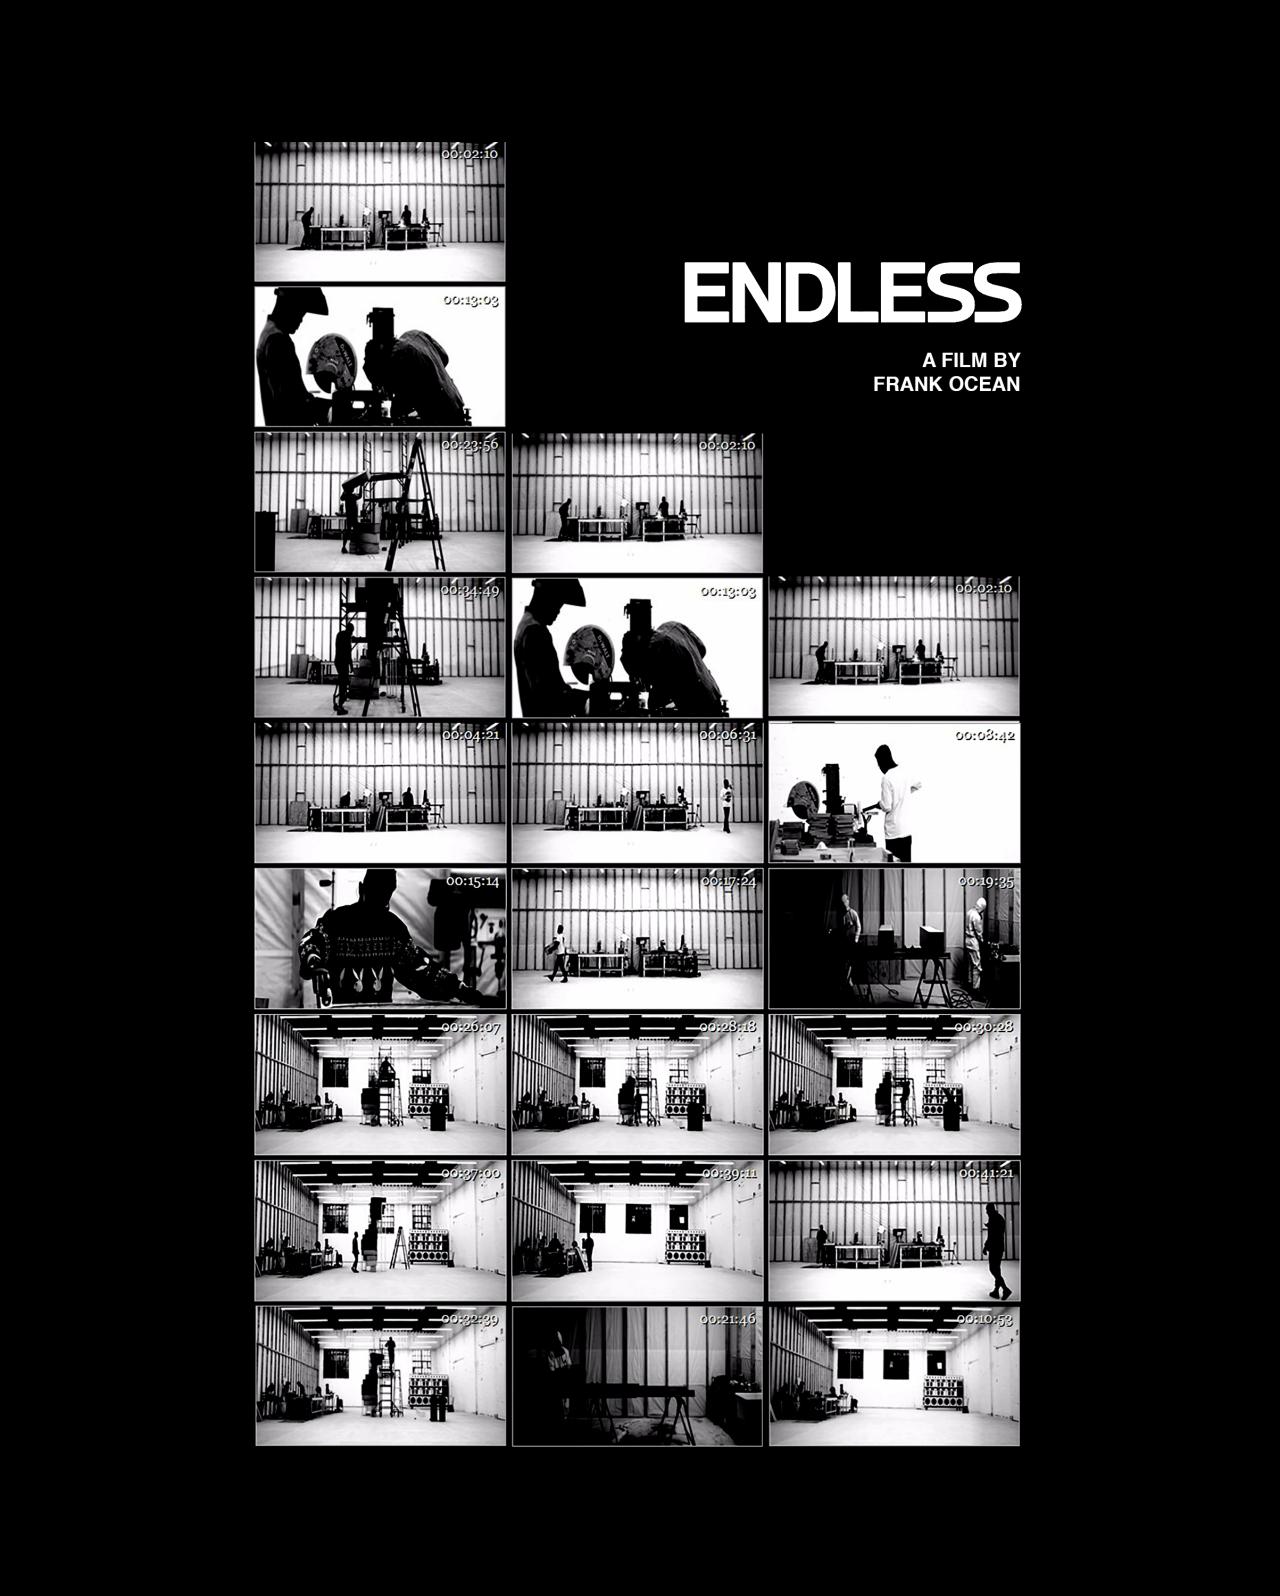 Frank Ocean Endless Poster 1 Frank Ocean Wallpaper Frank Ocean Boys Don T Cry